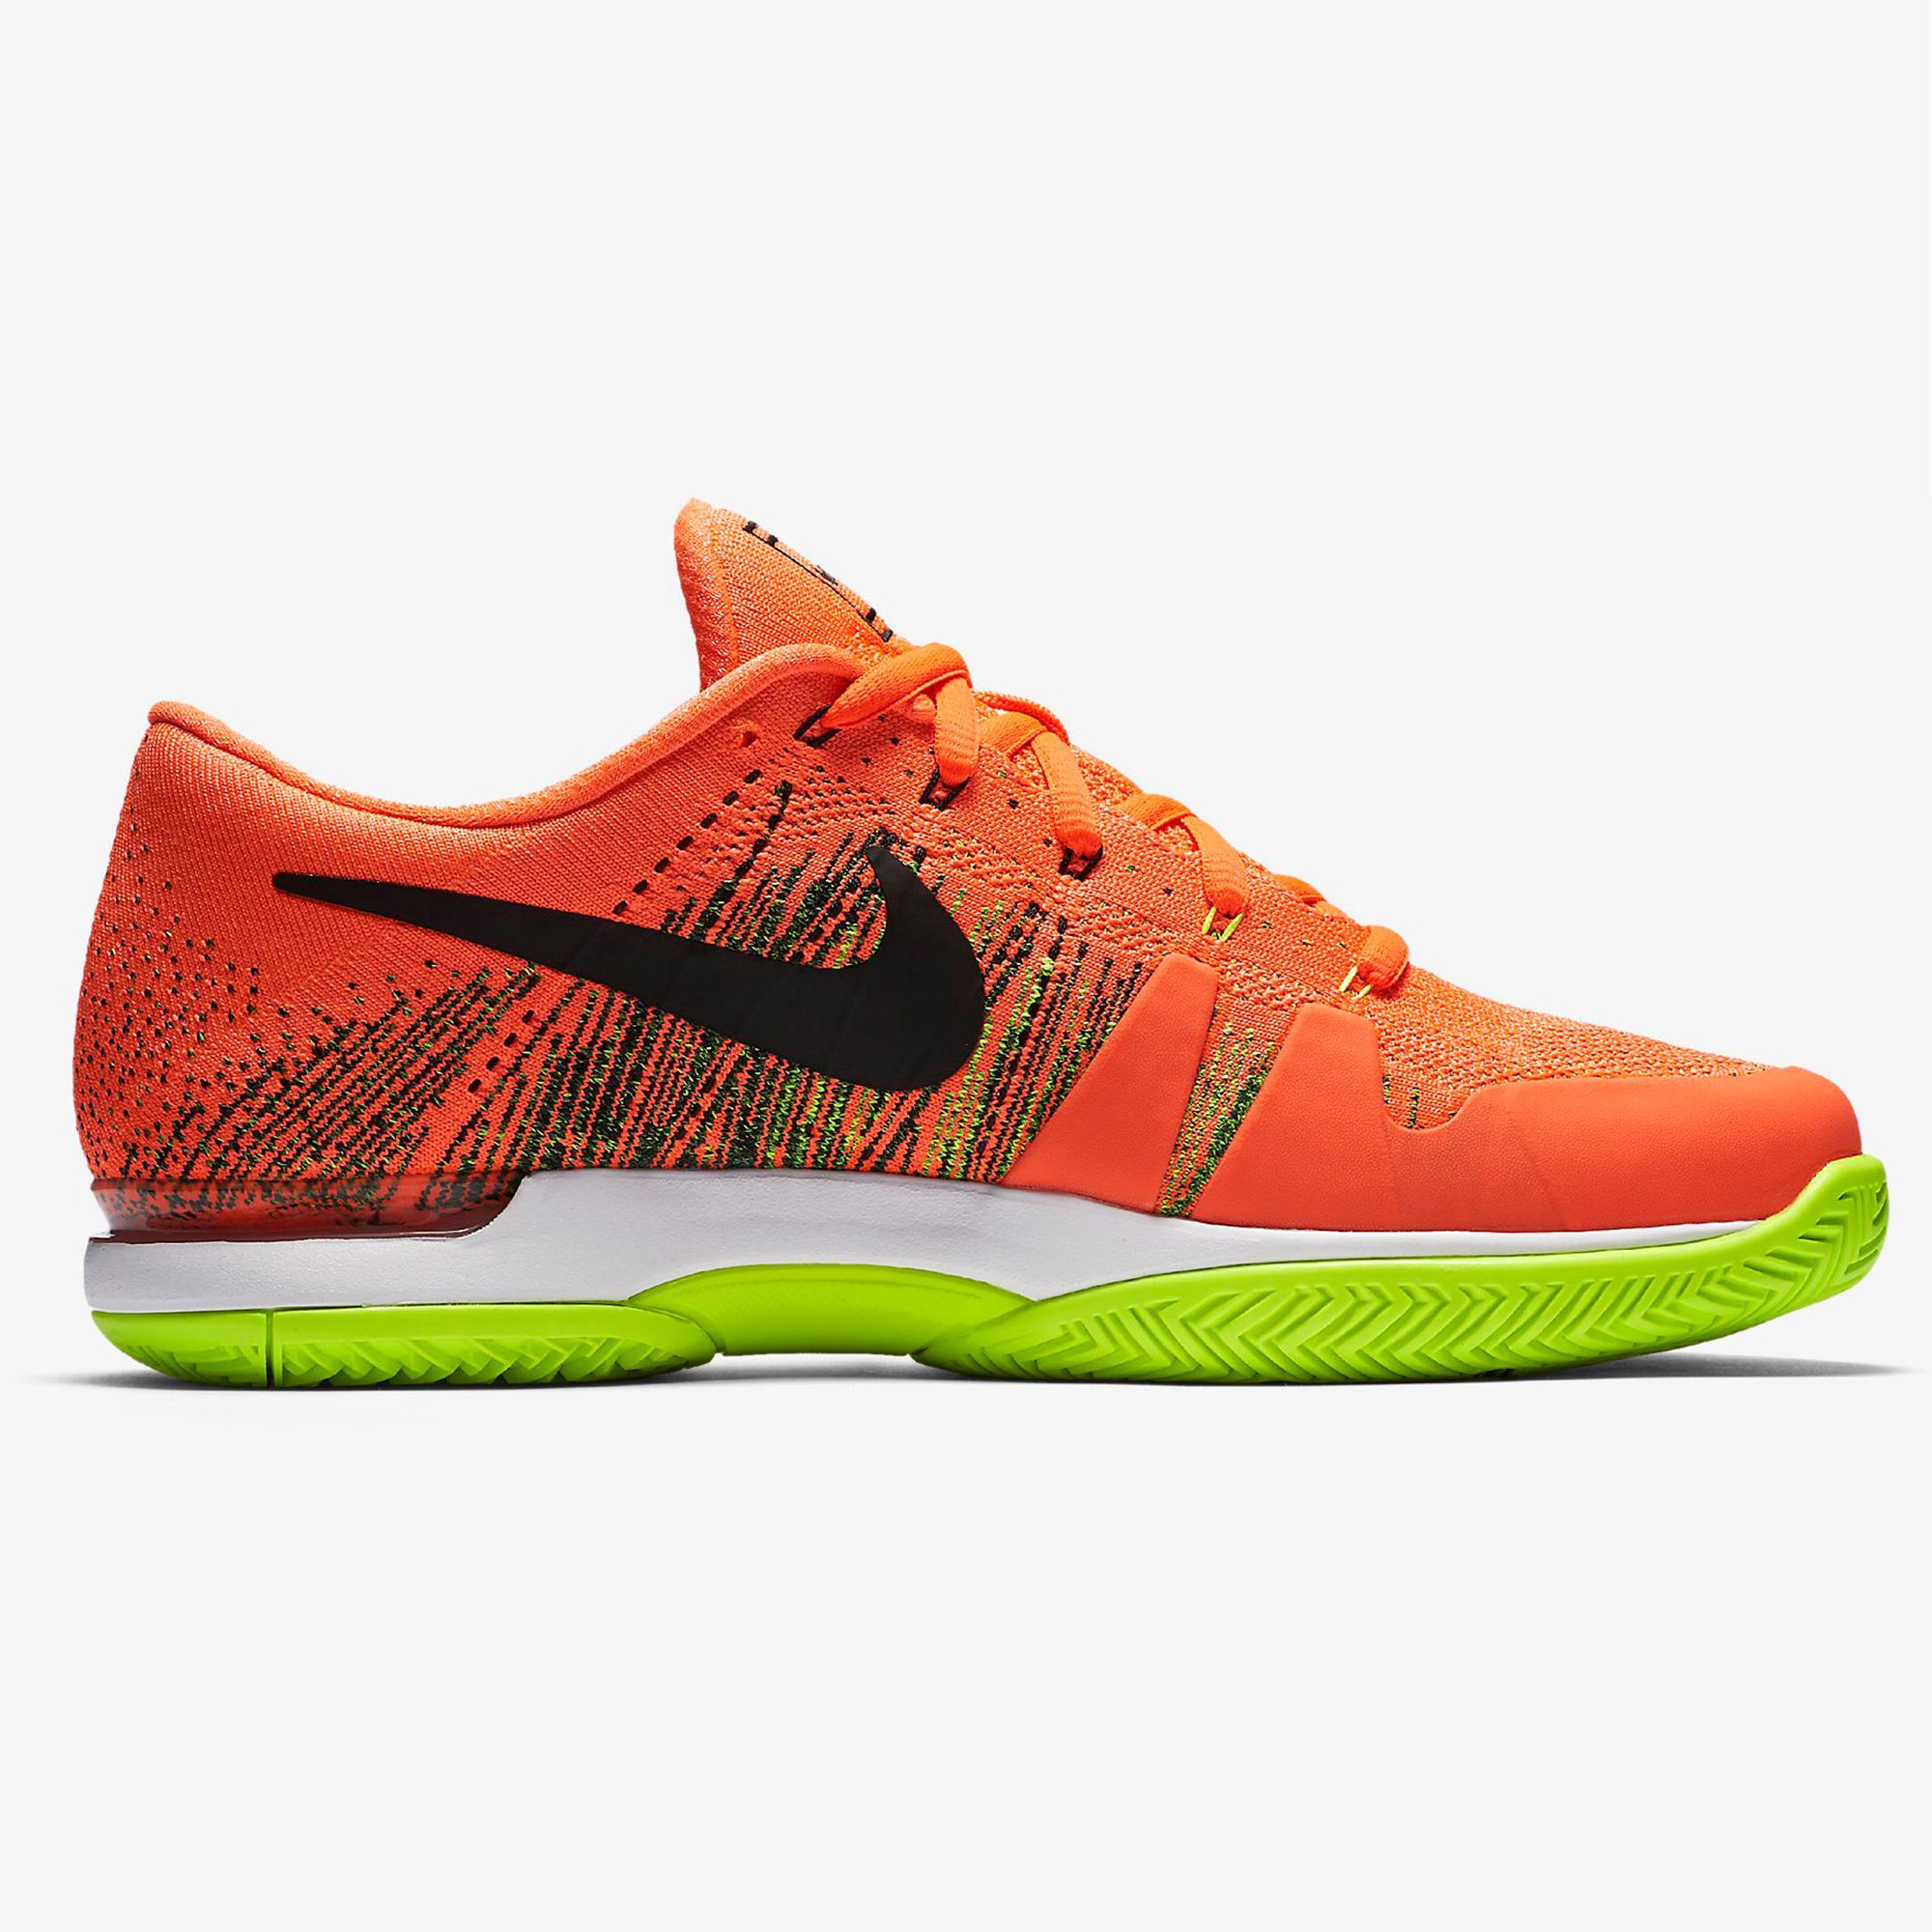 huge discount 57228 81e95 Nike Mens Zoom Vapor 9.5 Flyknit Tennis Shoes - Hyper Orange